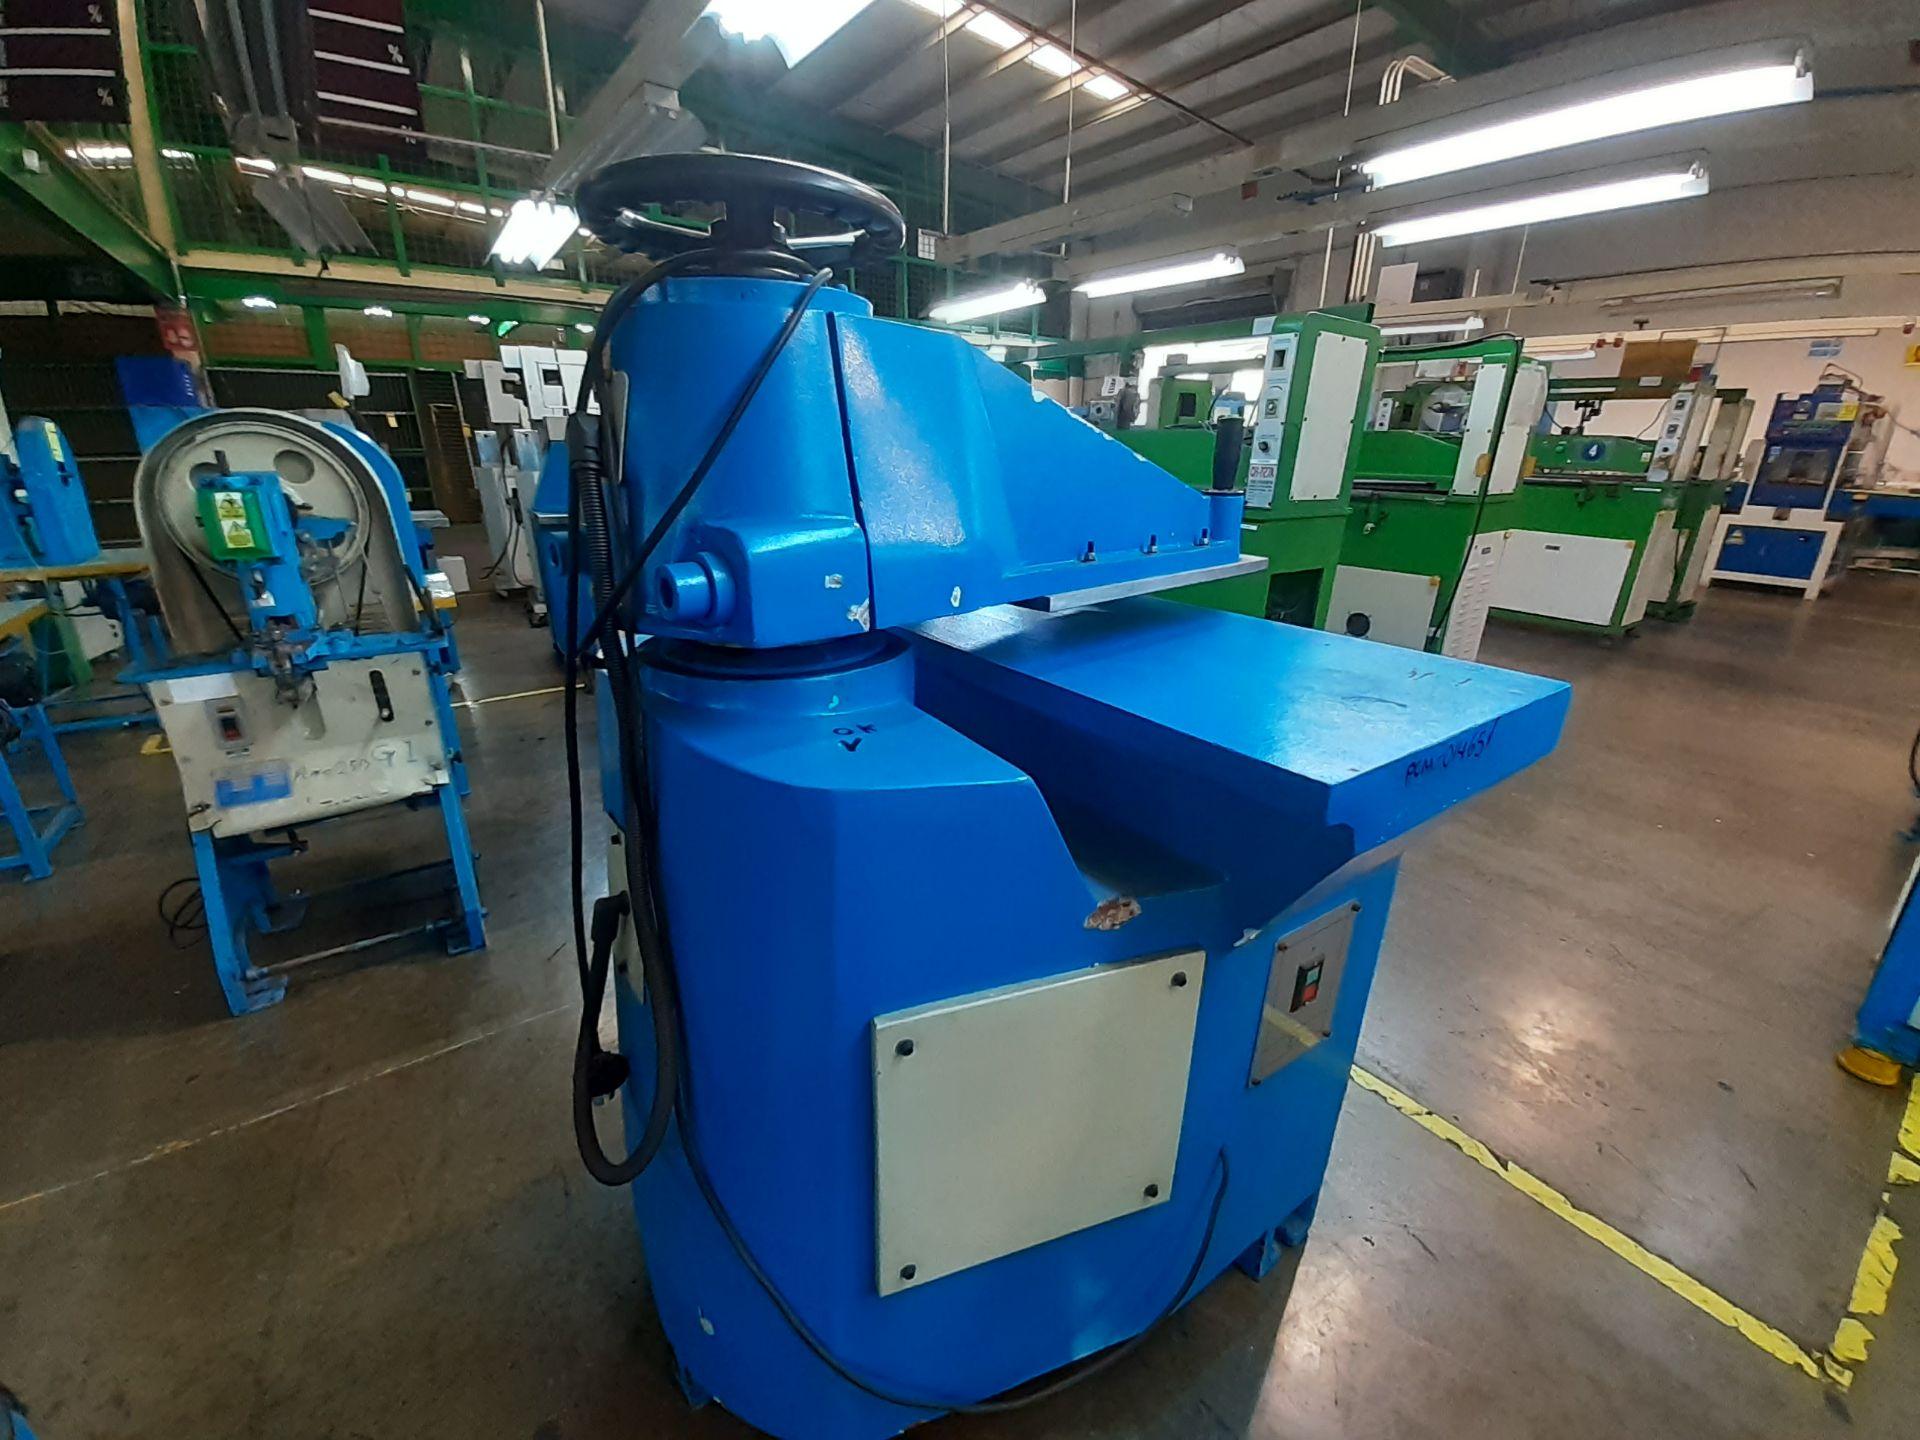 (2) Prensas de corte hidráulica de brazo oscilante, marca Dong guan Dah Dine Machine, Modelo: DJ-103 - Image 4 of 17